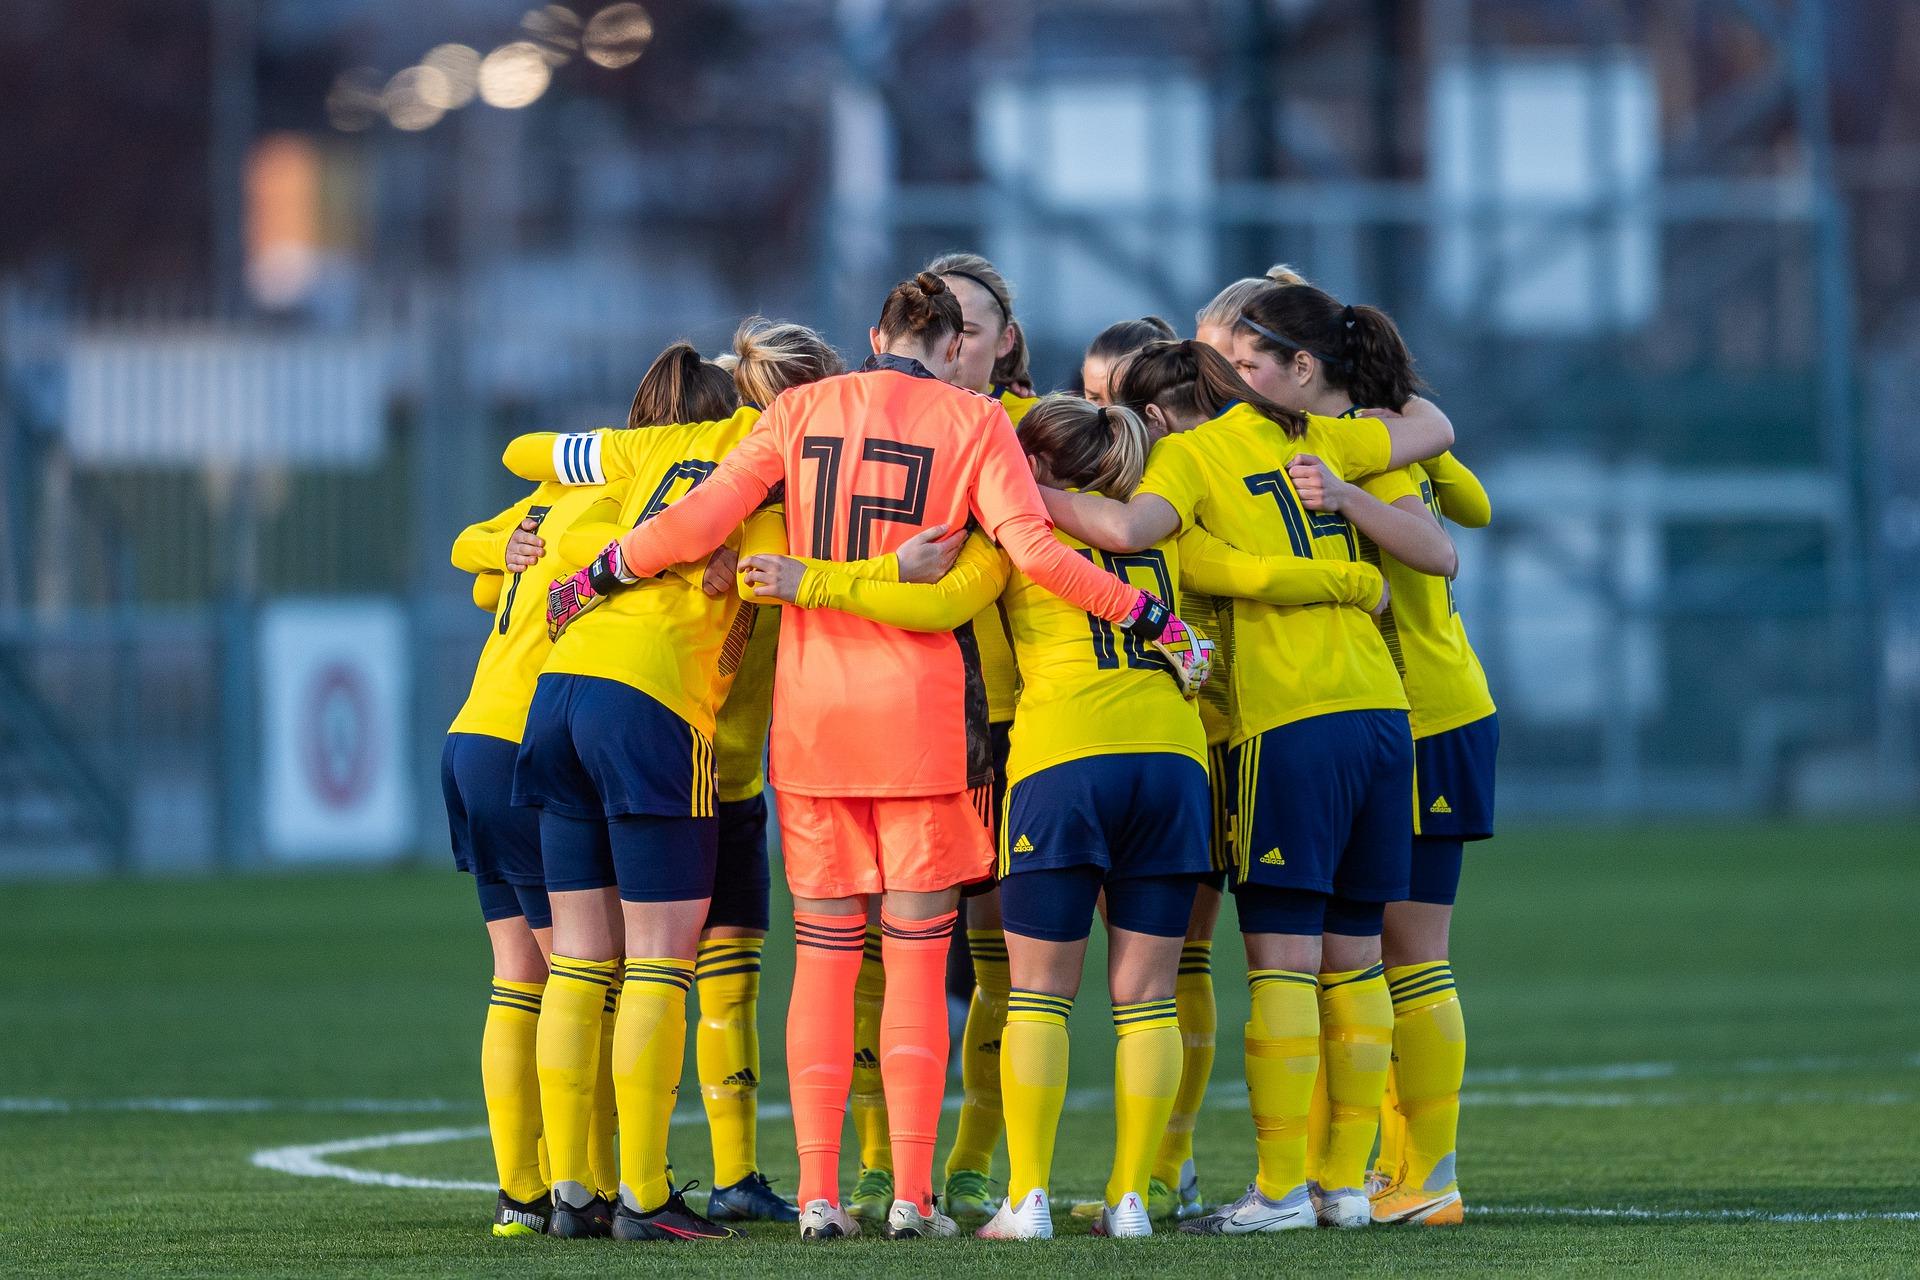 profesionalización futbol femenino